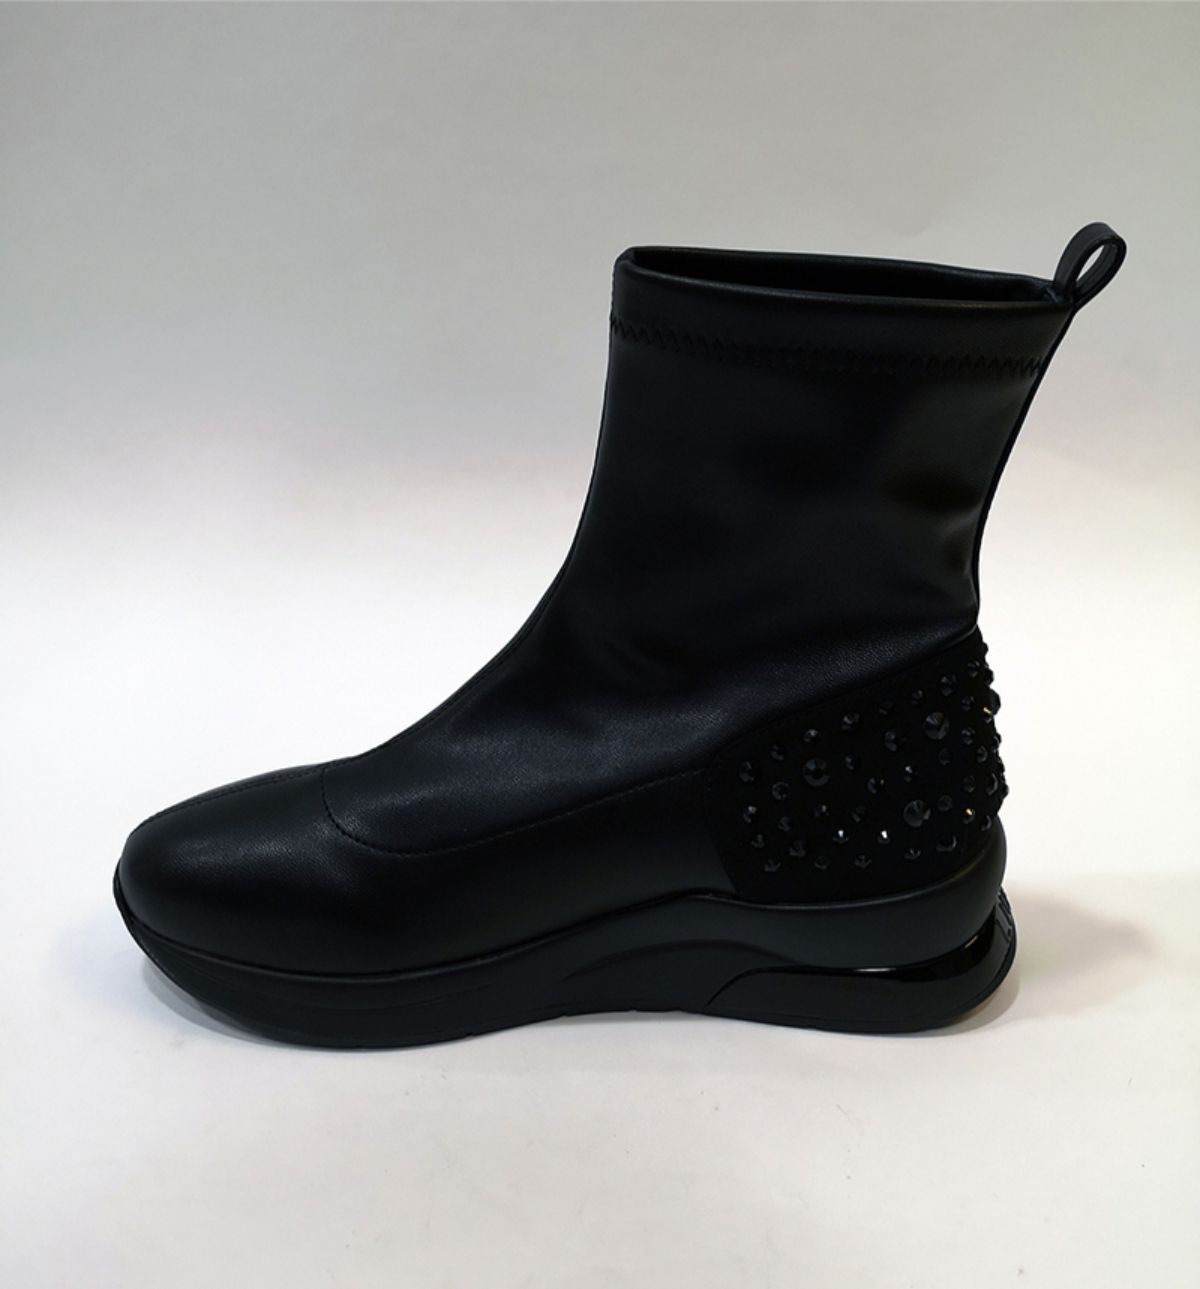 B69035-JX001 KARLIE 28 BOOTY BLACK 2